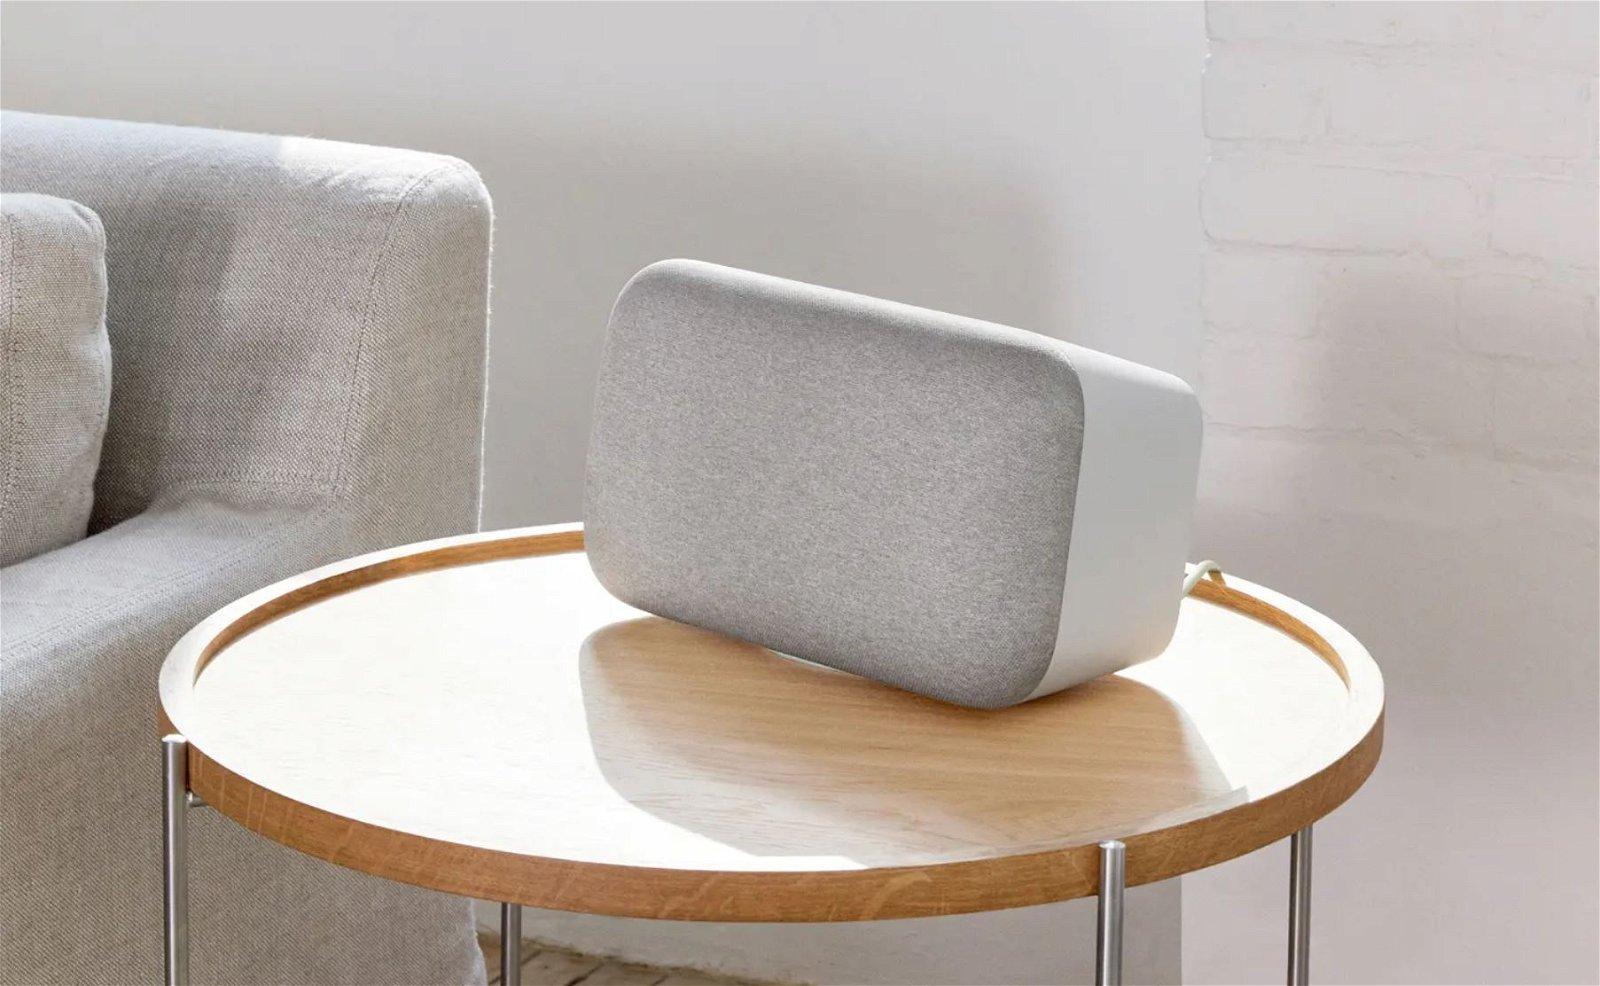 Google Reveals Pixel Buds, Nest Wifi, Google Home Max 3